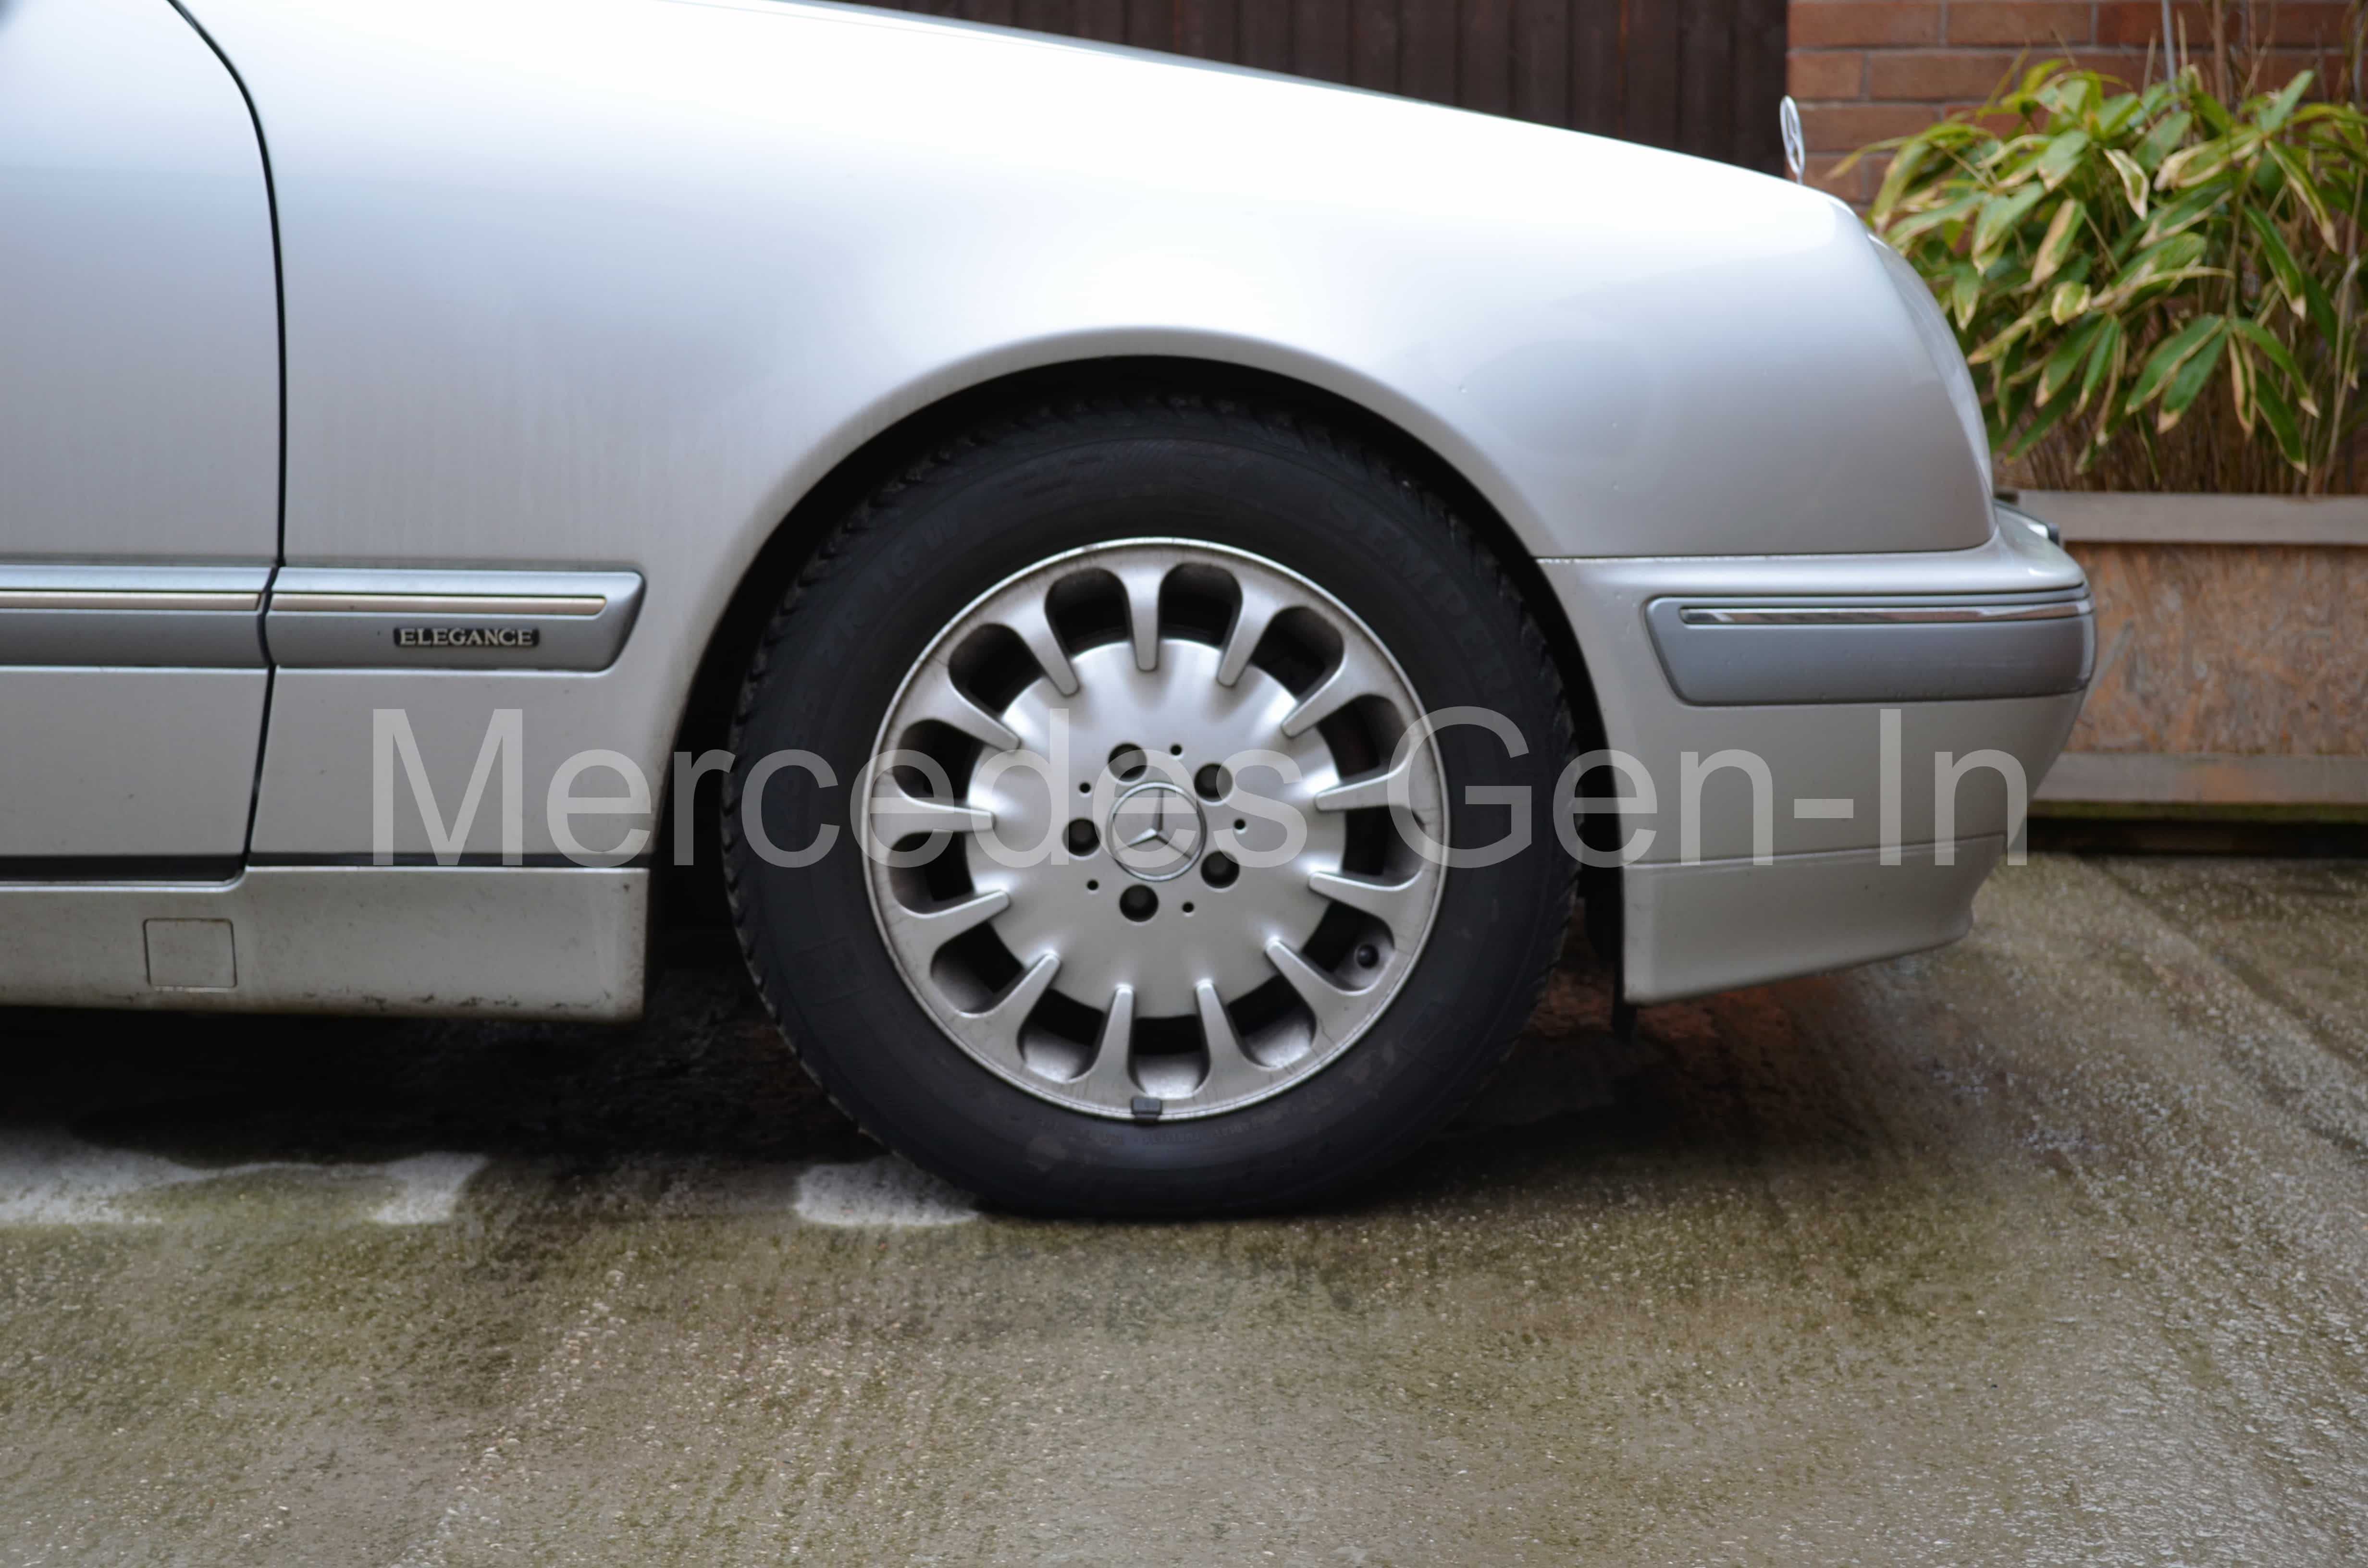 Mercedes E Class W210 Front Spring Perch Failure